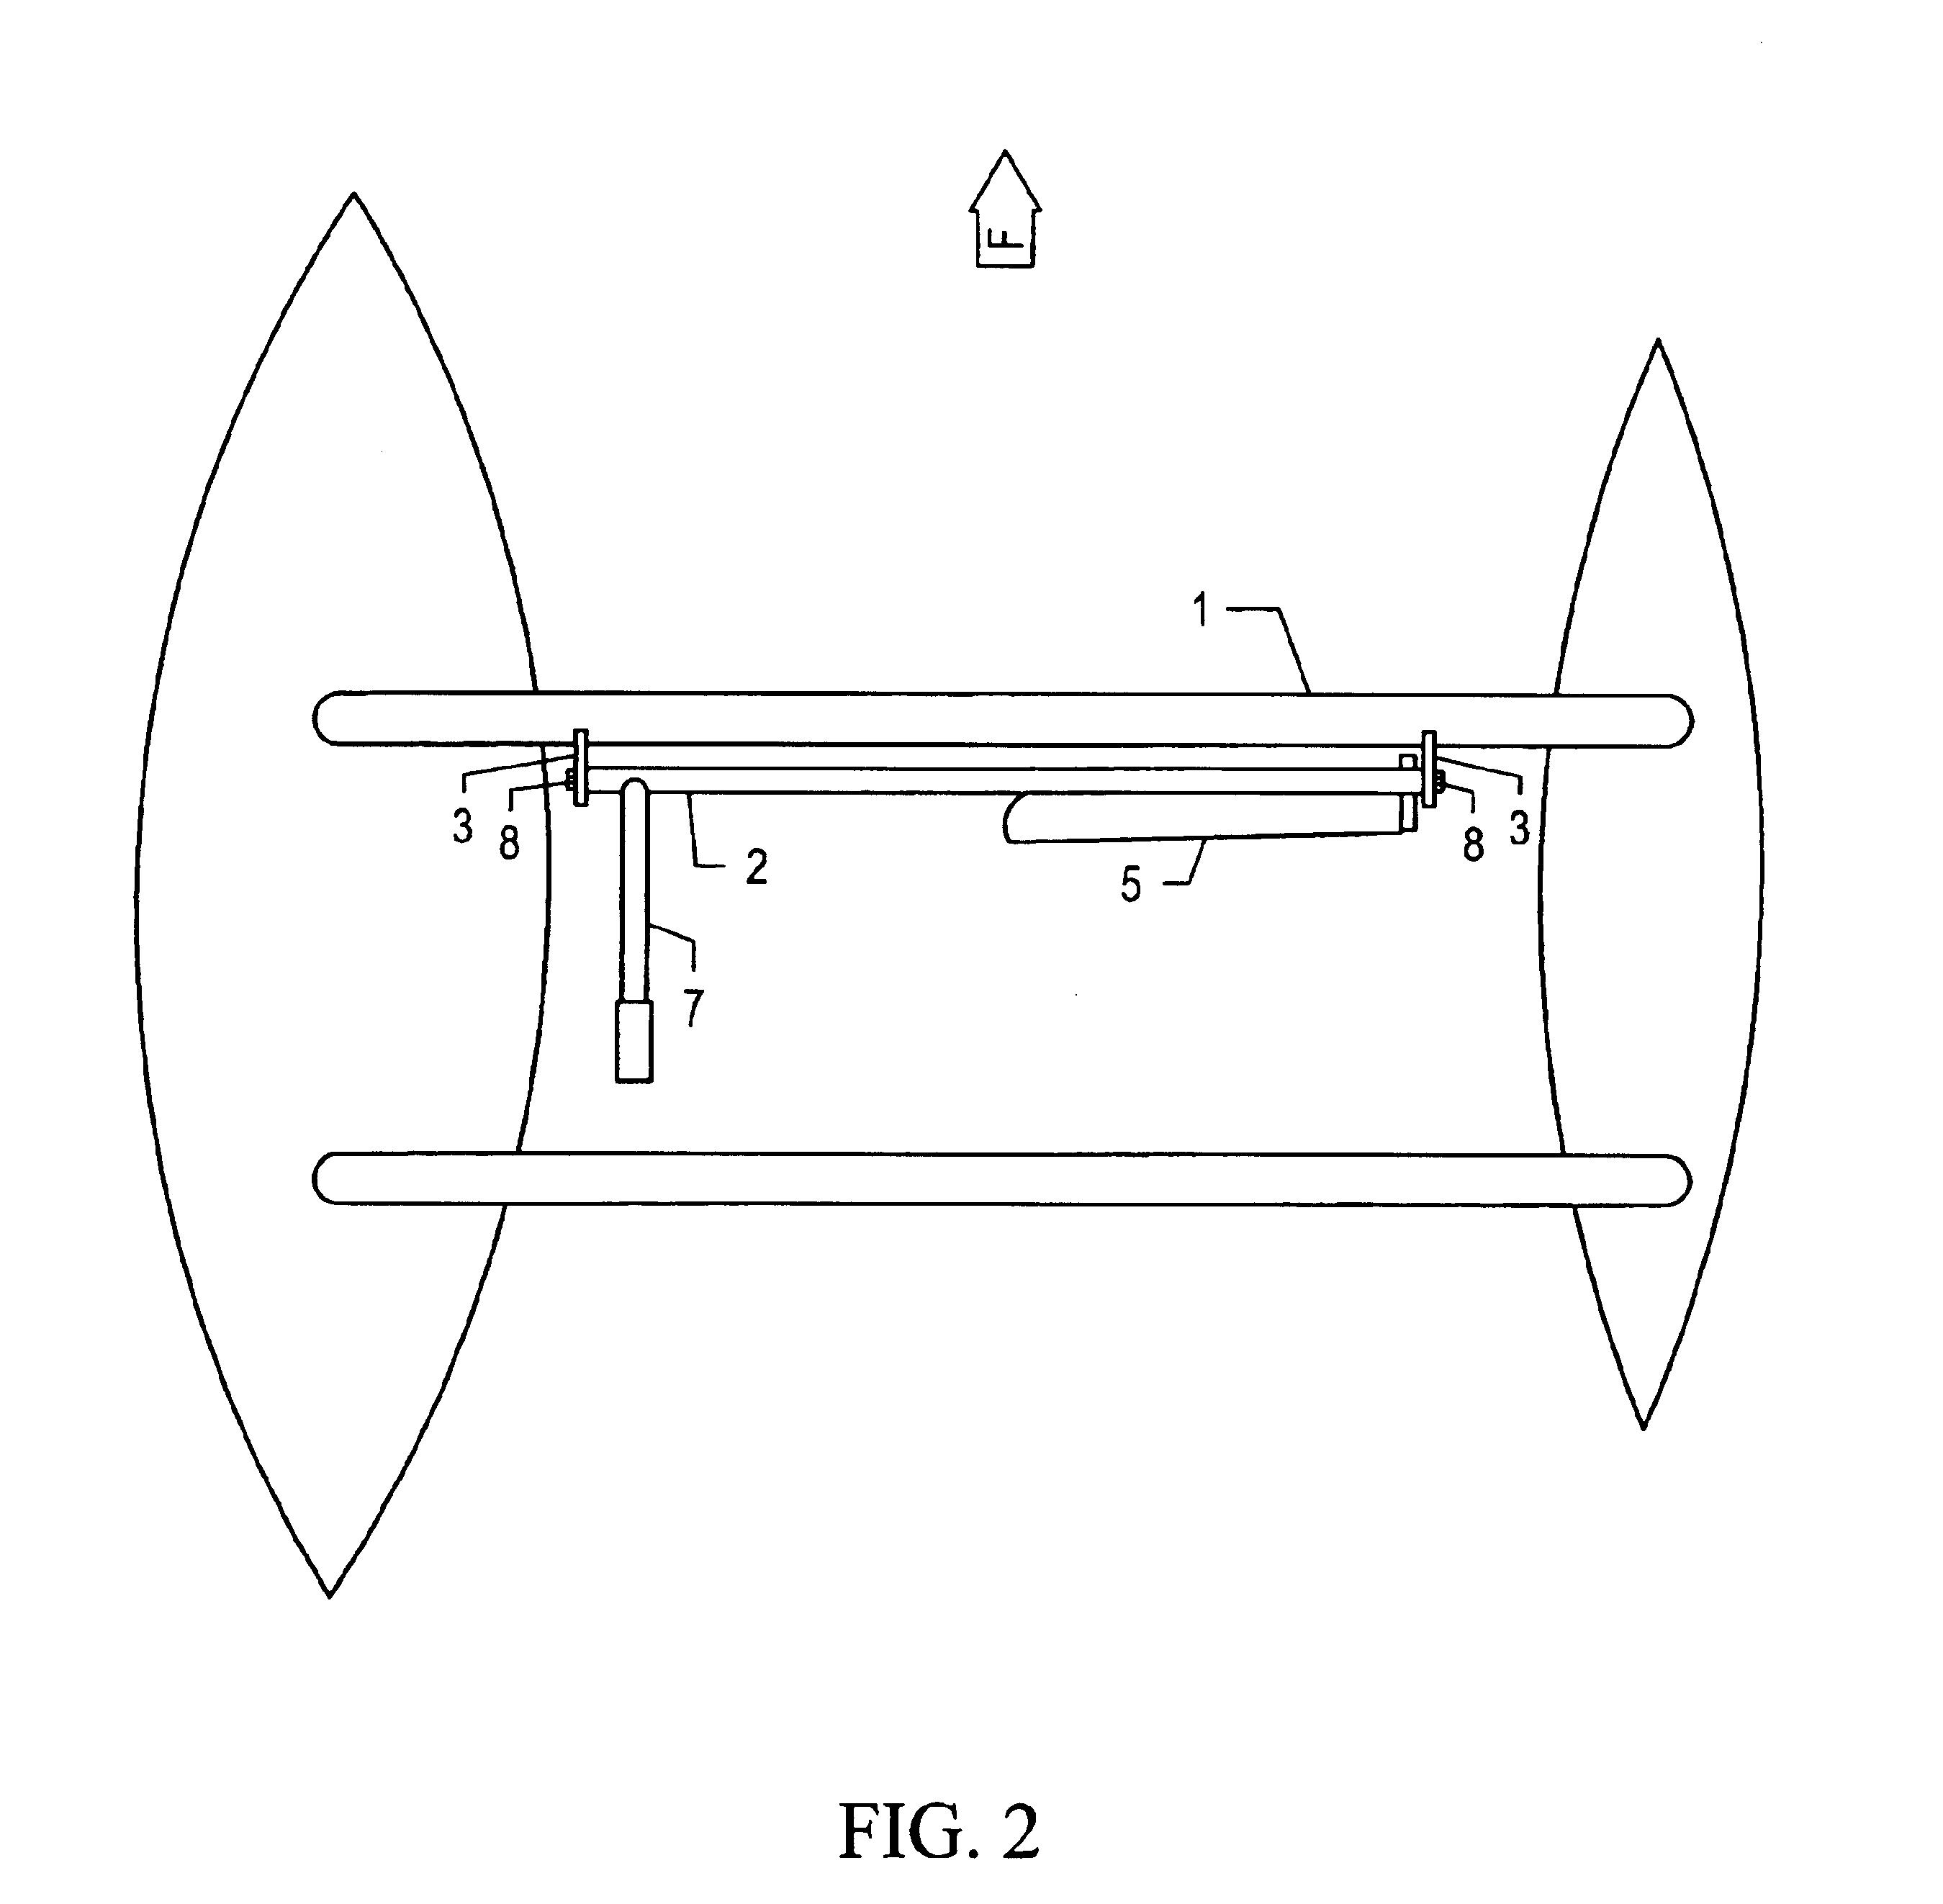 patent us6932018 manual hydrofoil and spar truss. Black Bedroom Furniture Sets. Home Design Ideas